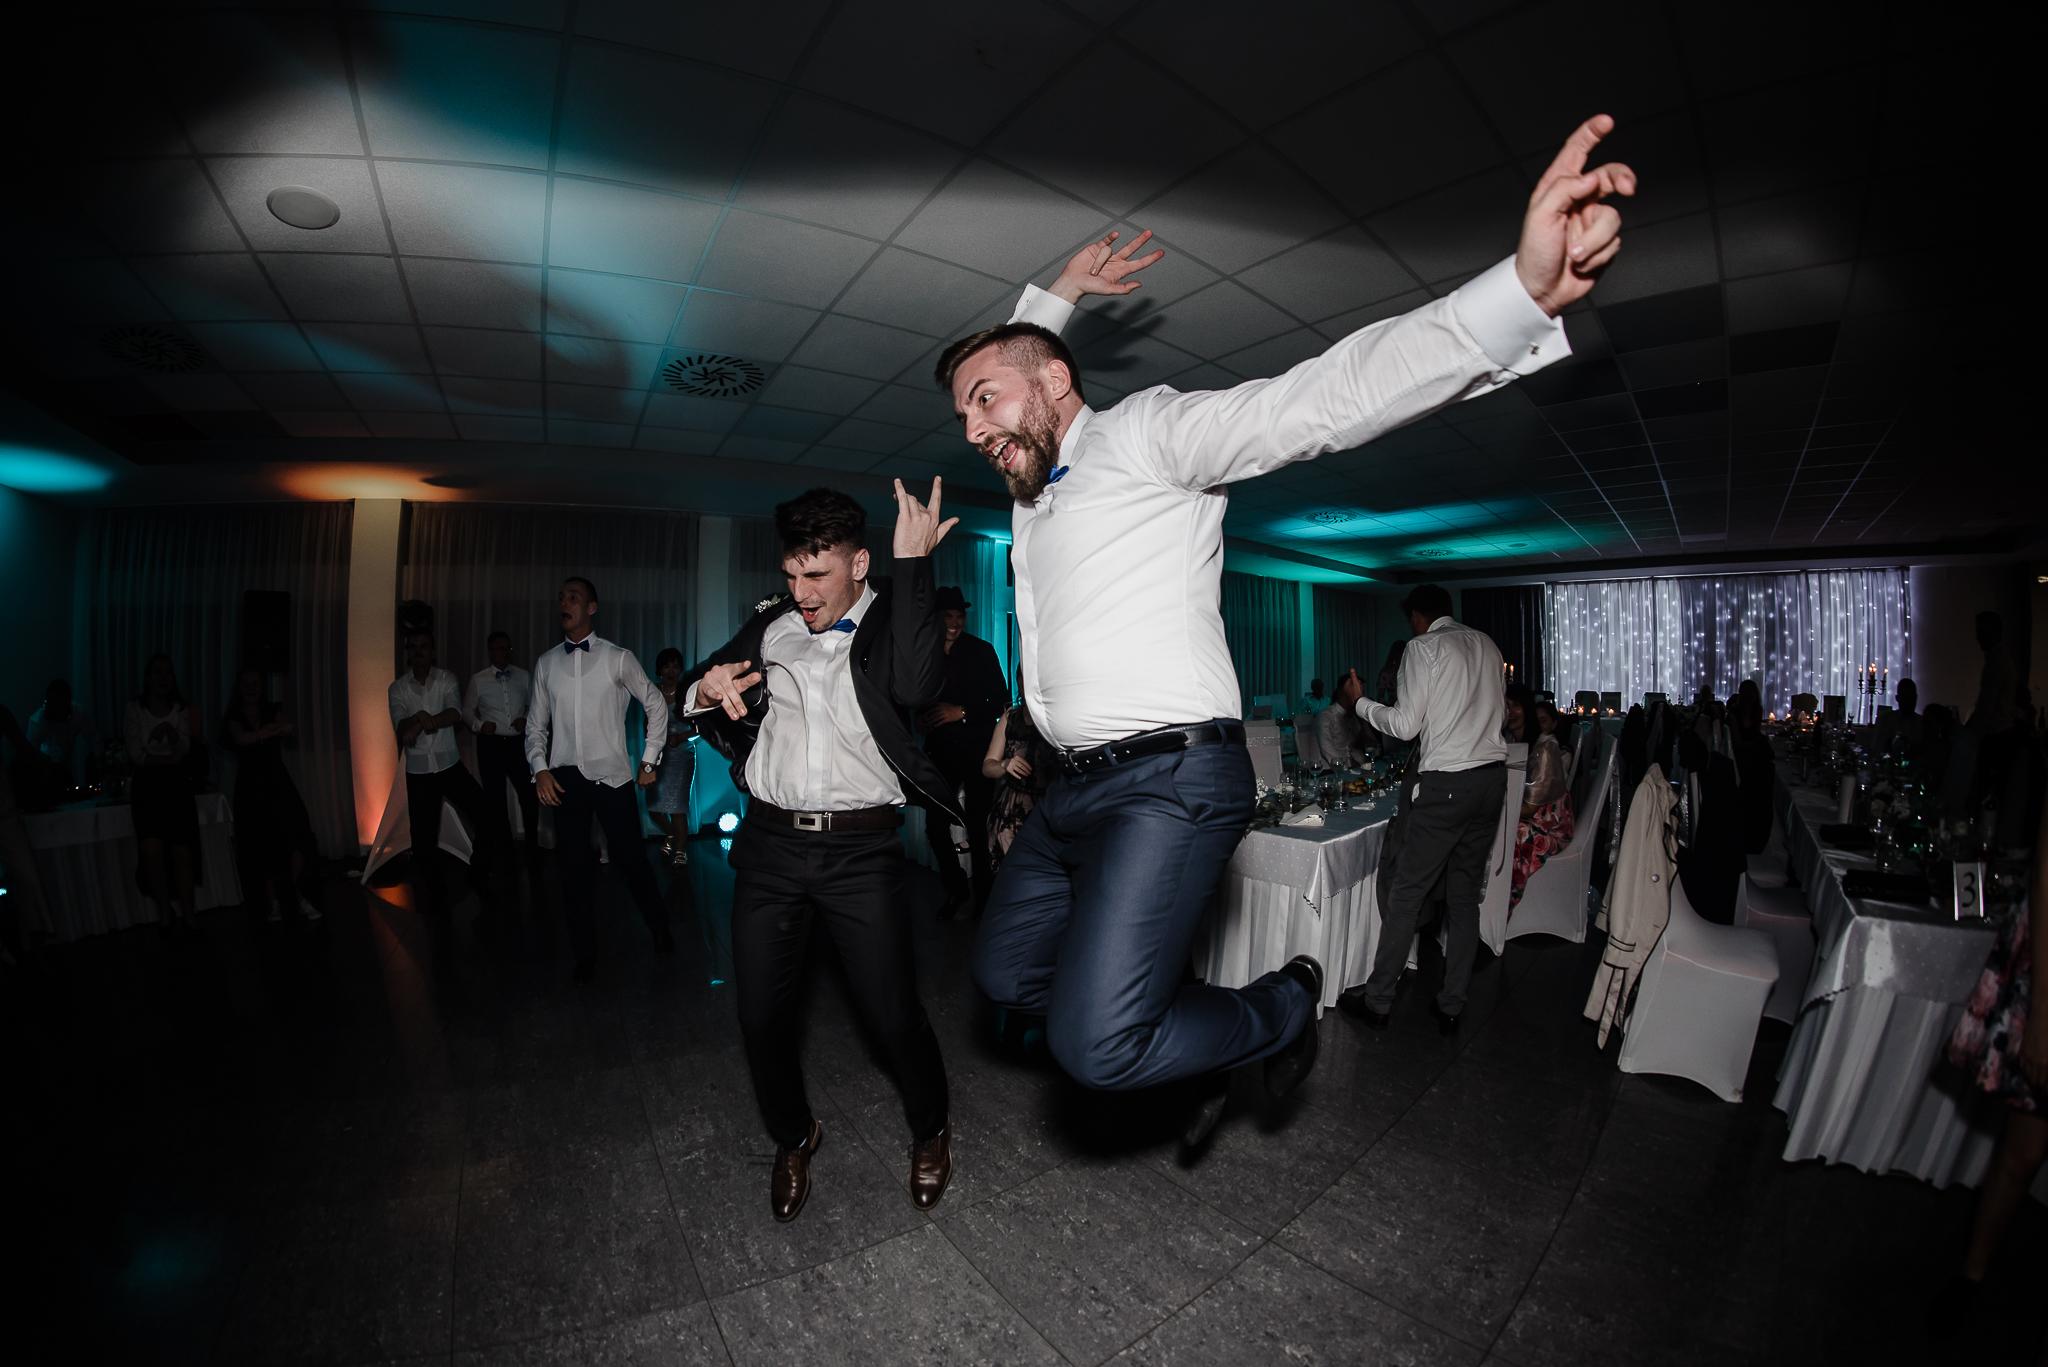 Svadba Pata, Kulturák u Palušáka 05 #svadobnyDJ, #djanasvadbu, #svadba, #svadbapata, #Pata #DJAnavi